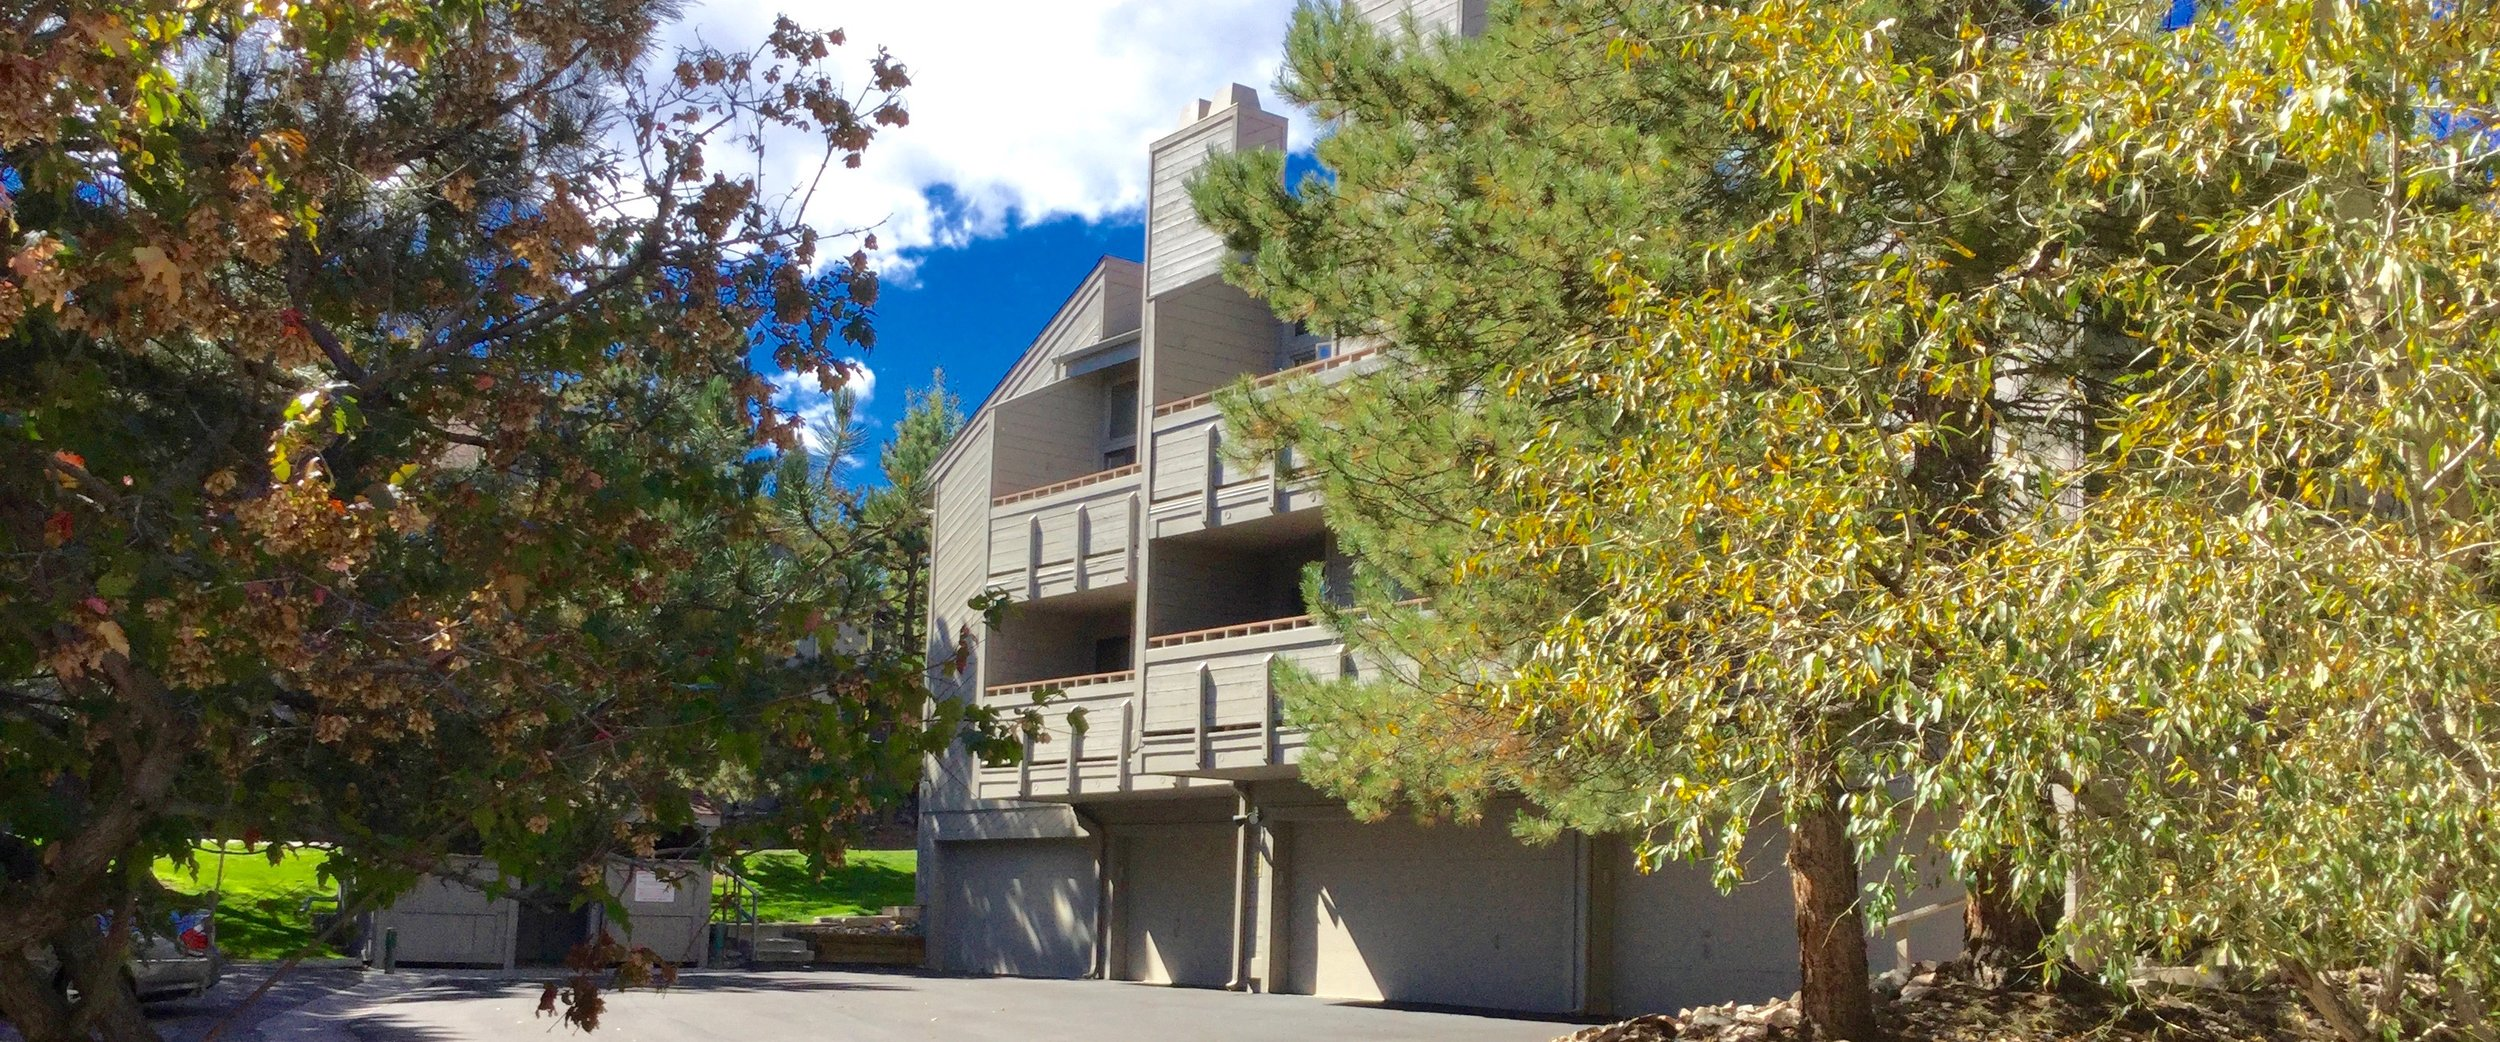 Each Genesee Village Condo features a garage space.